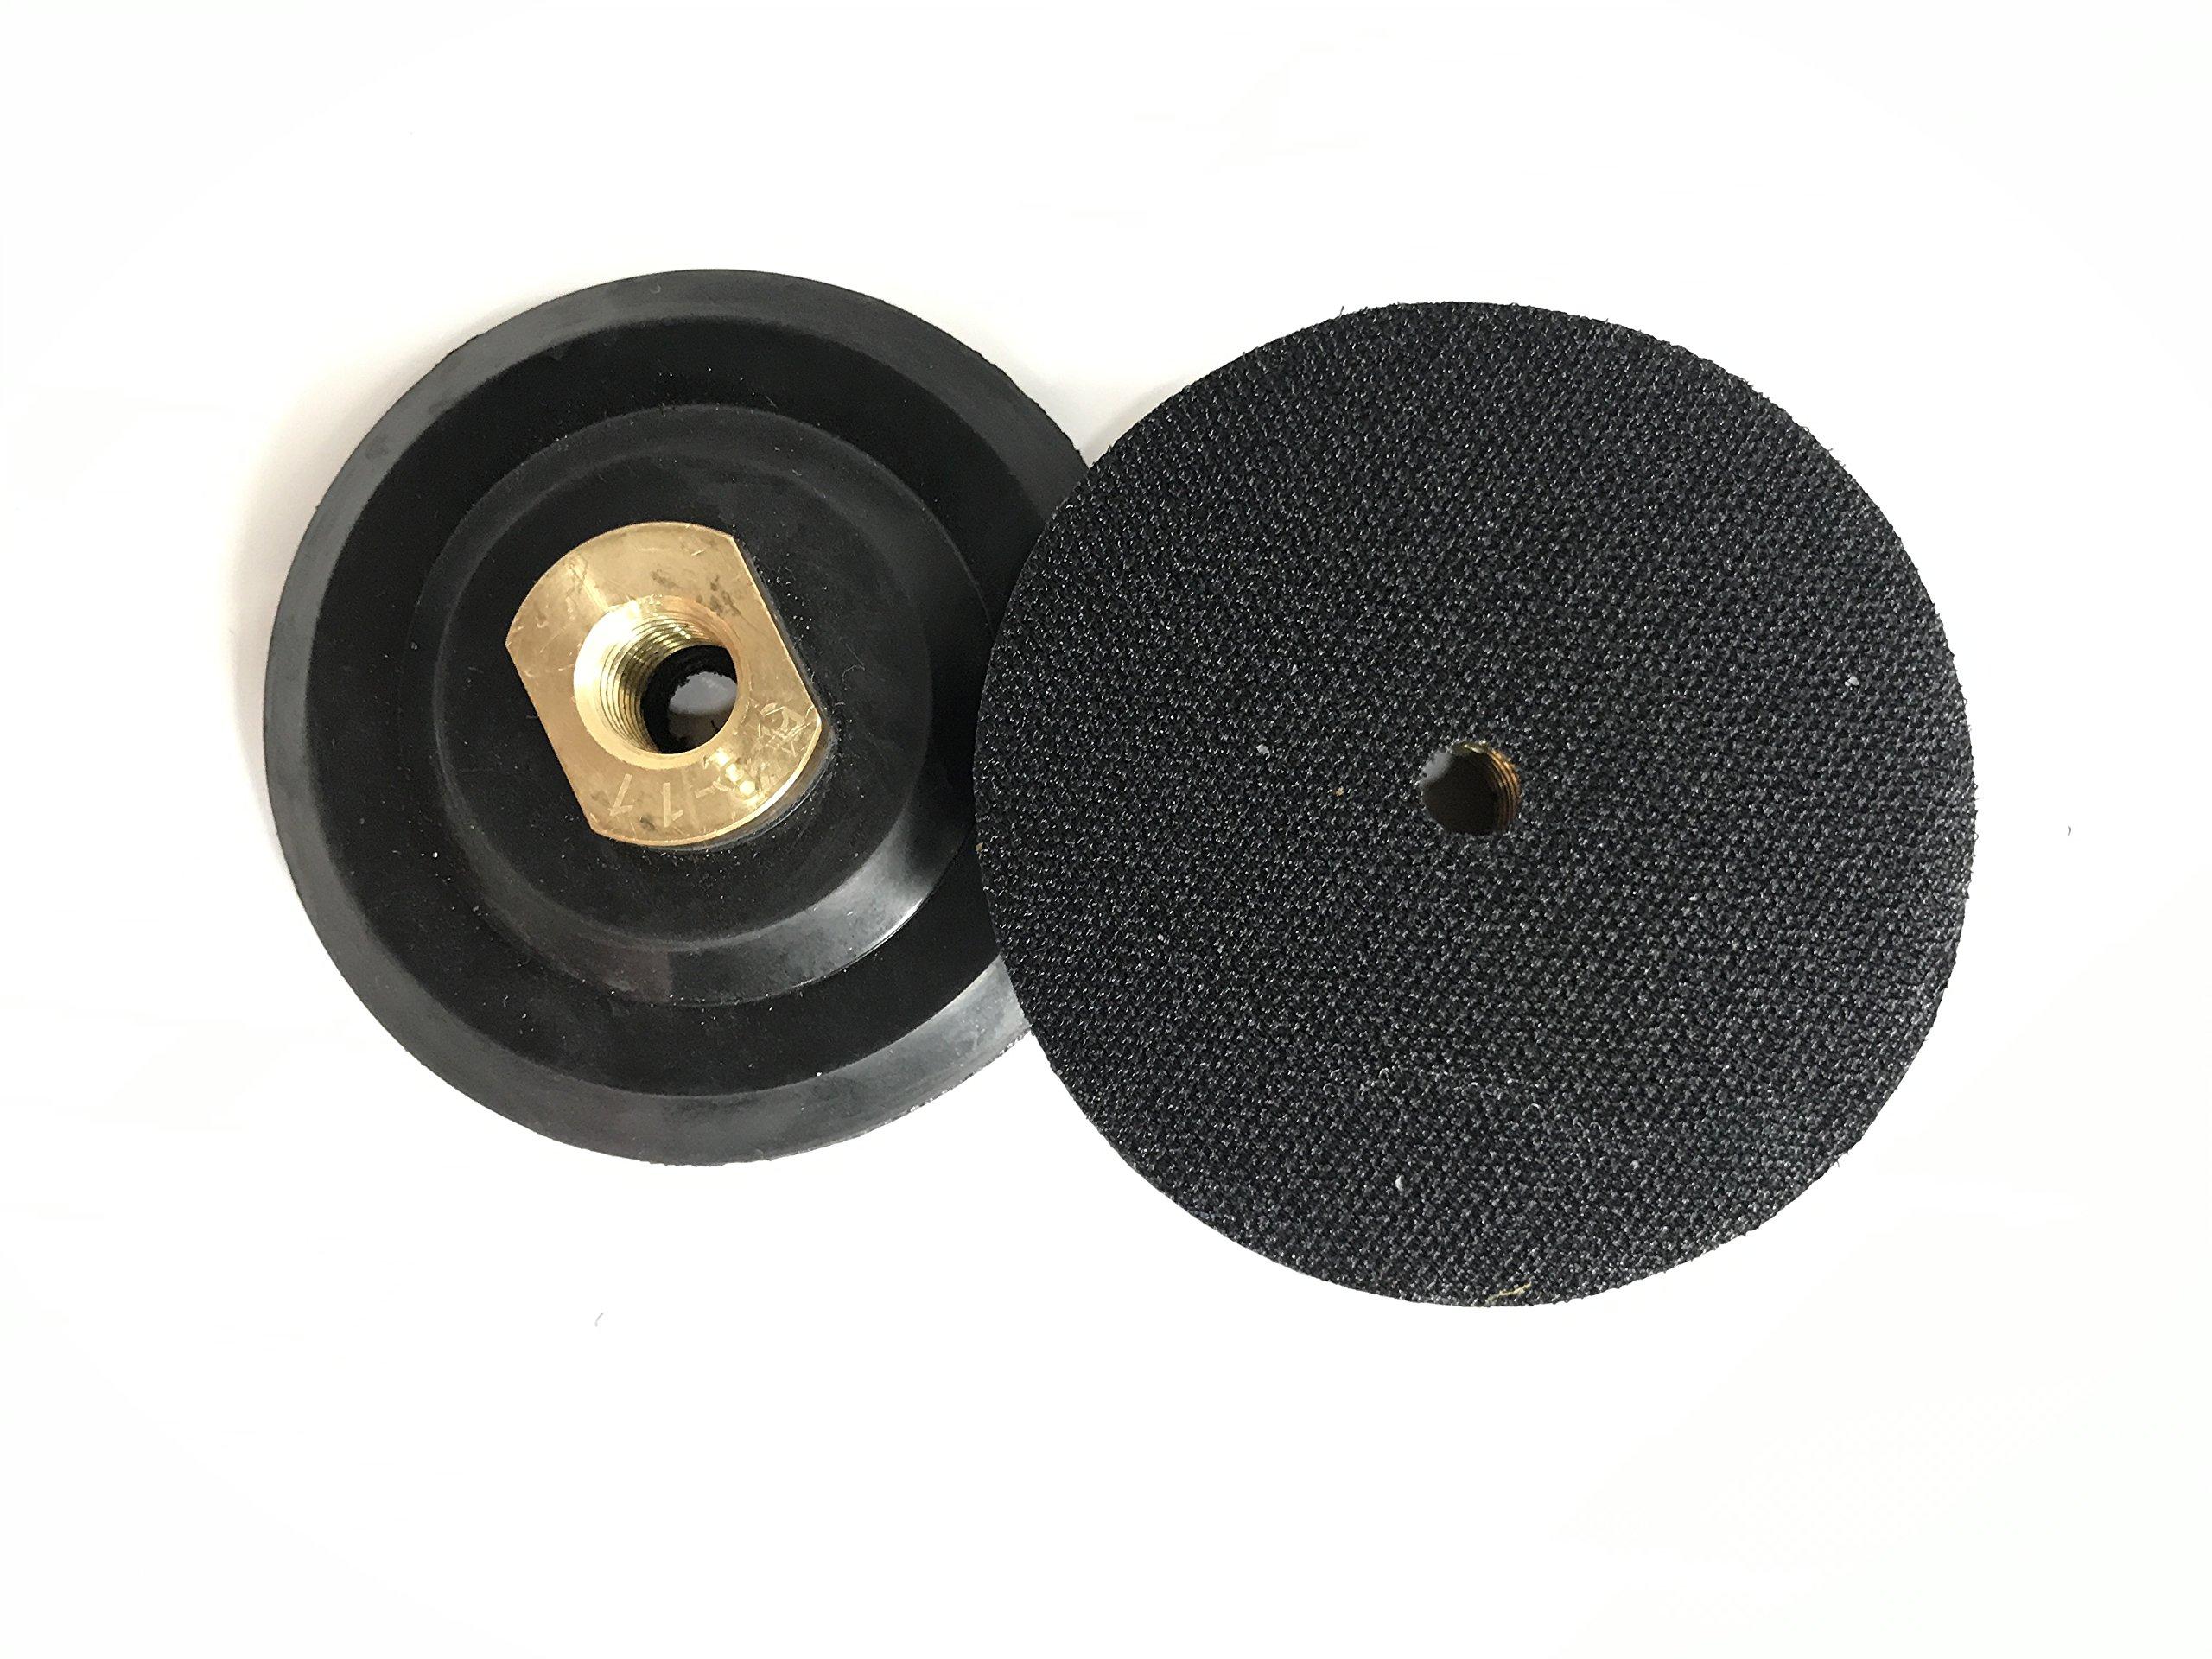 TUFF BUFF - Wet/Dry Diamond Polishing Pads - 11 Piece Set with Rubber Backer for Granite, Stone, Concrete, Marble, Travertine, Terrazzo- 4'' Inch Pads by Tuff Buff (Image #7)